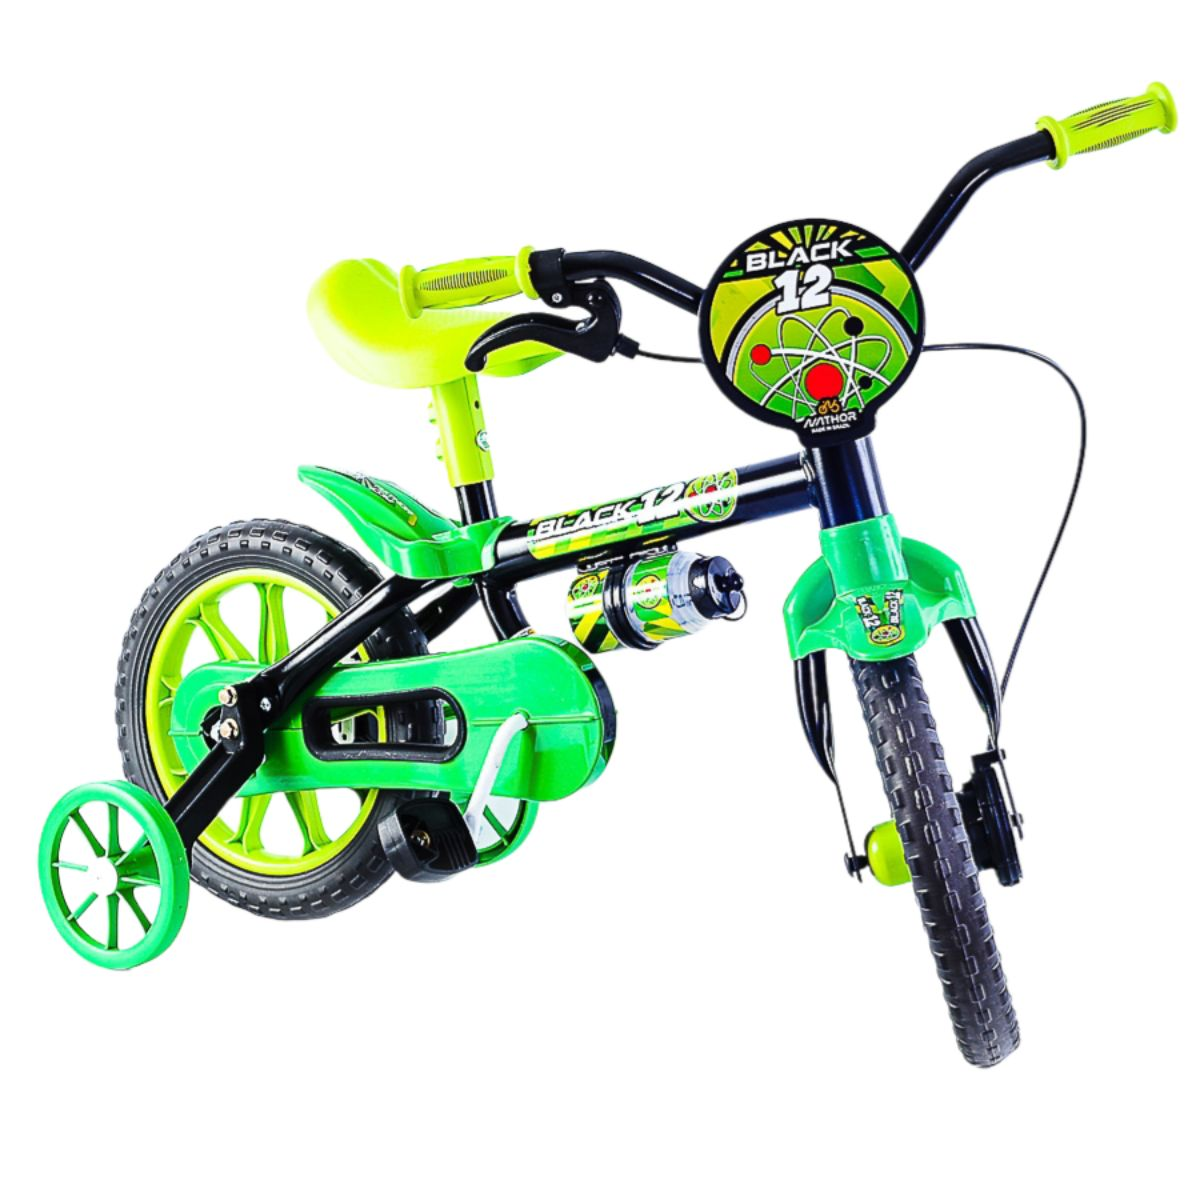 Bicicleta Black Aro 12 Verde e Preta